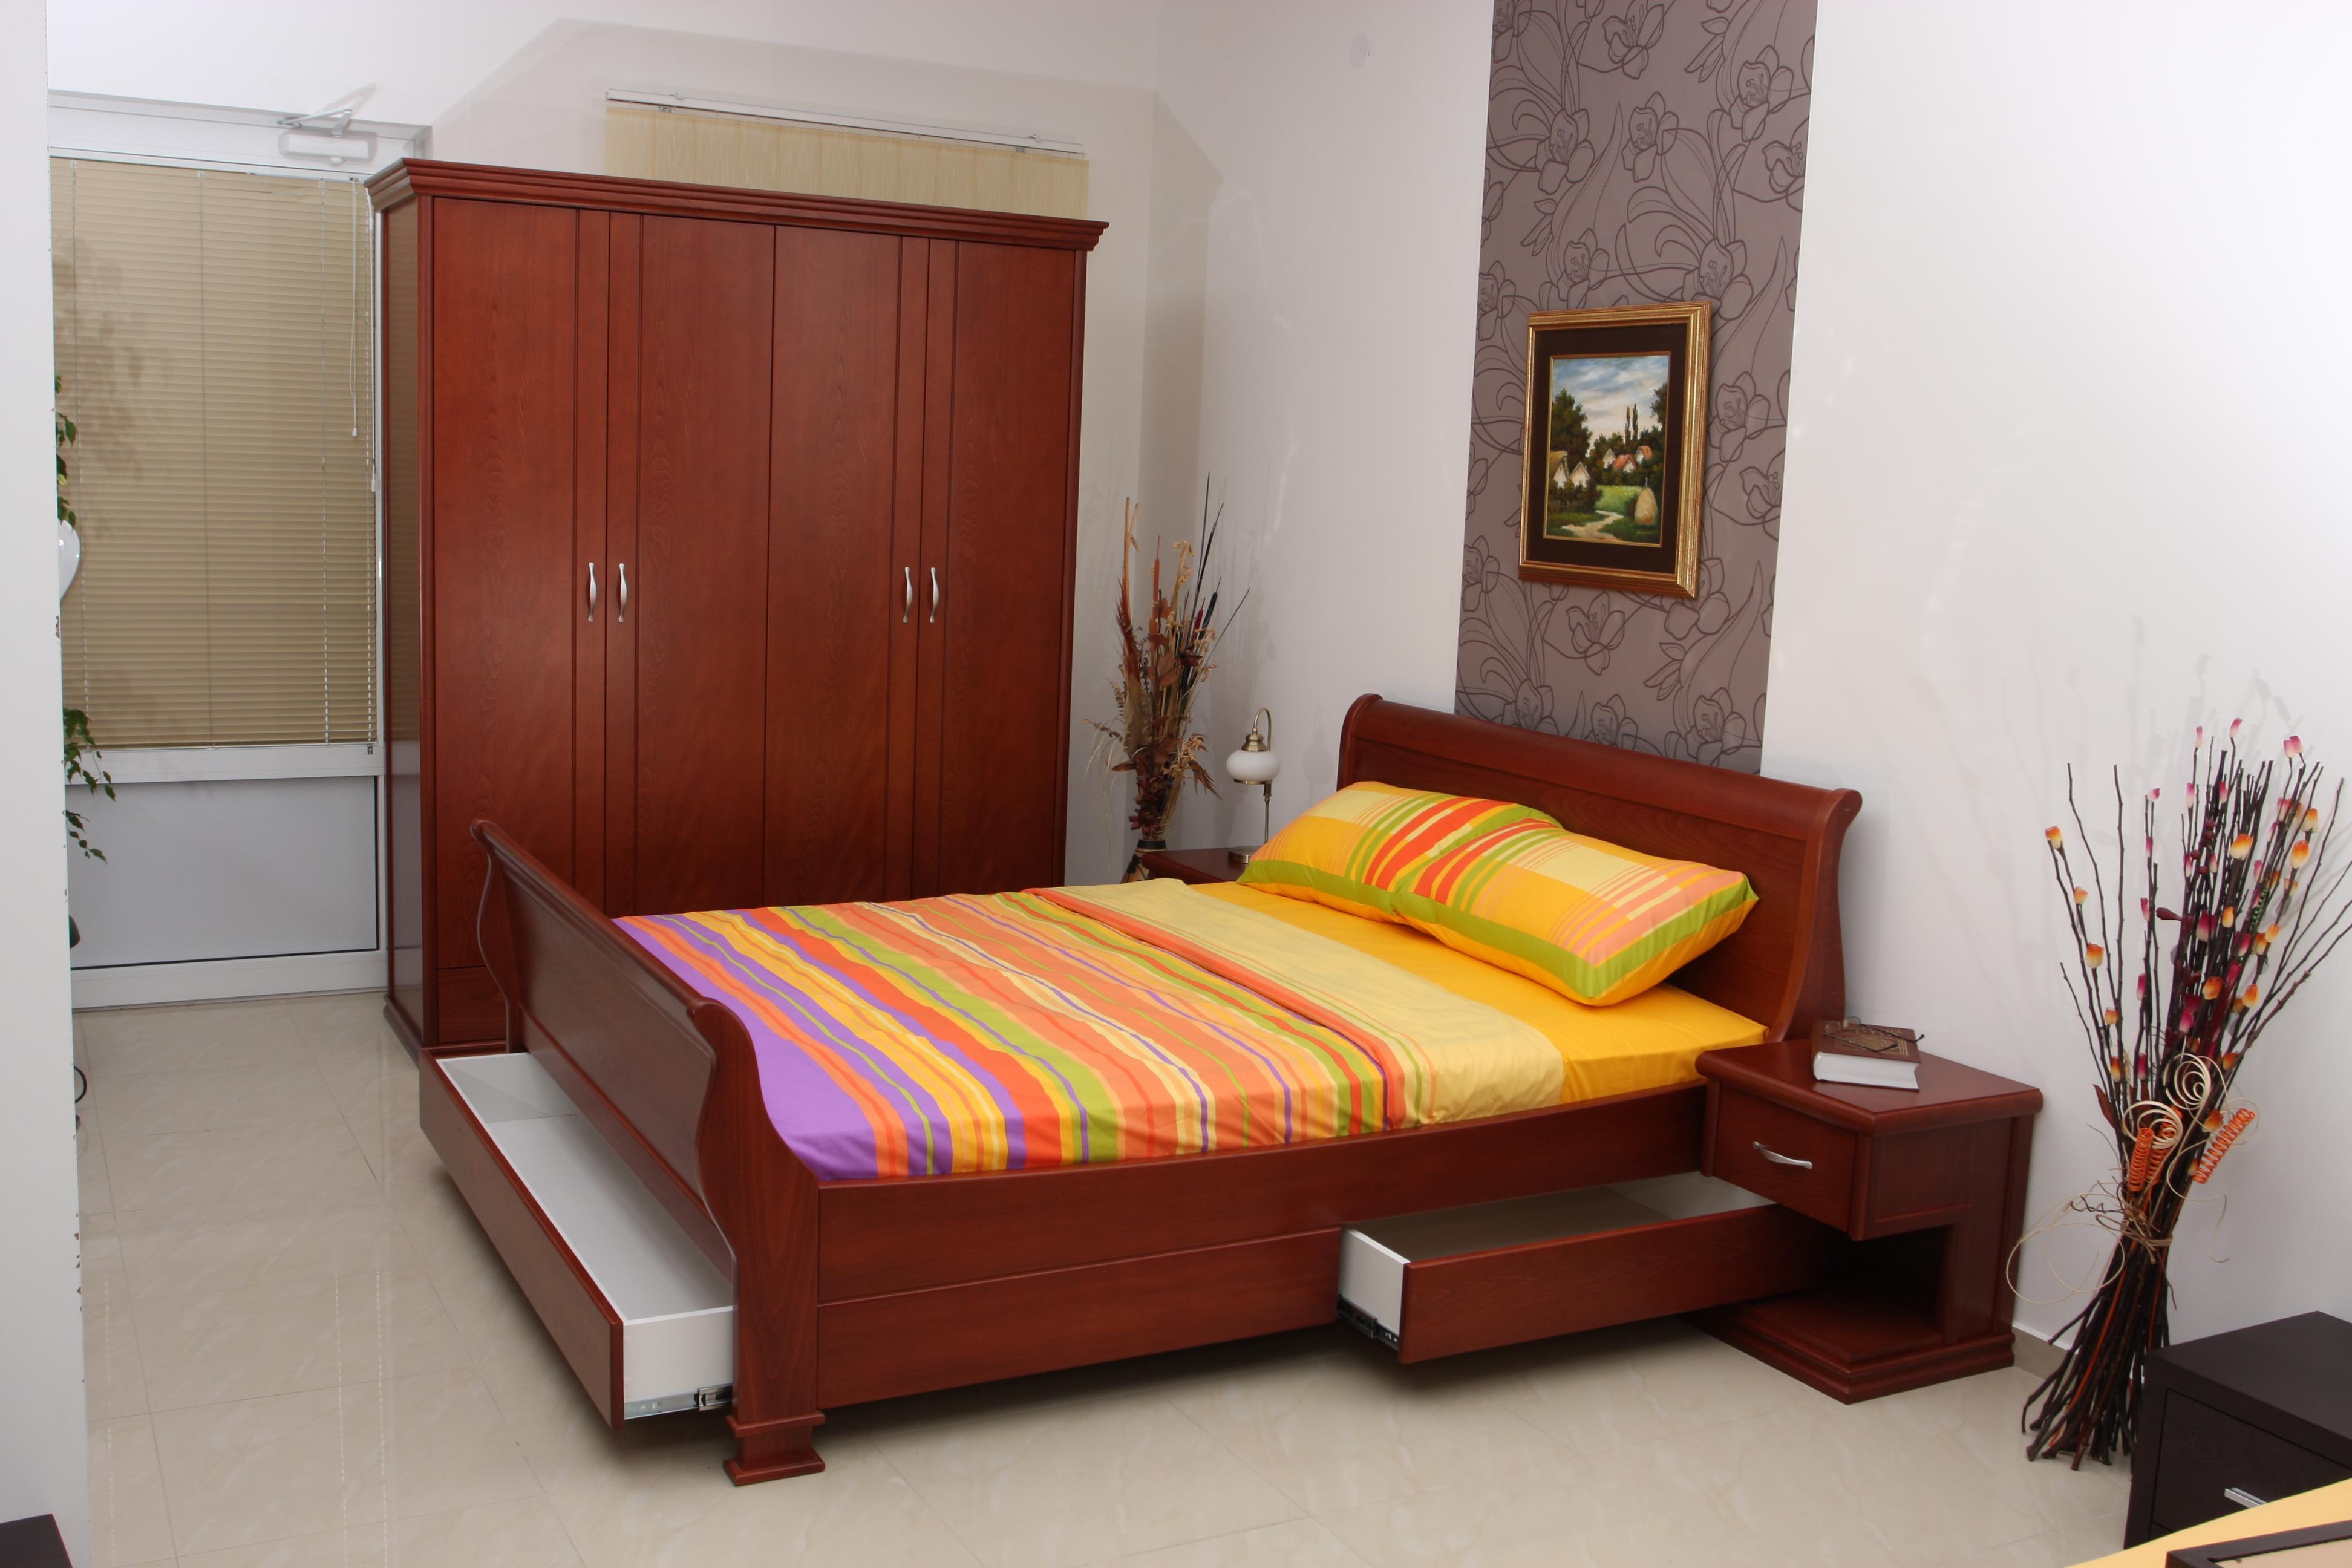 Conjuntos de dormitorio tradicional 50 0 100 0 piezas for Les model de chambre a coucher